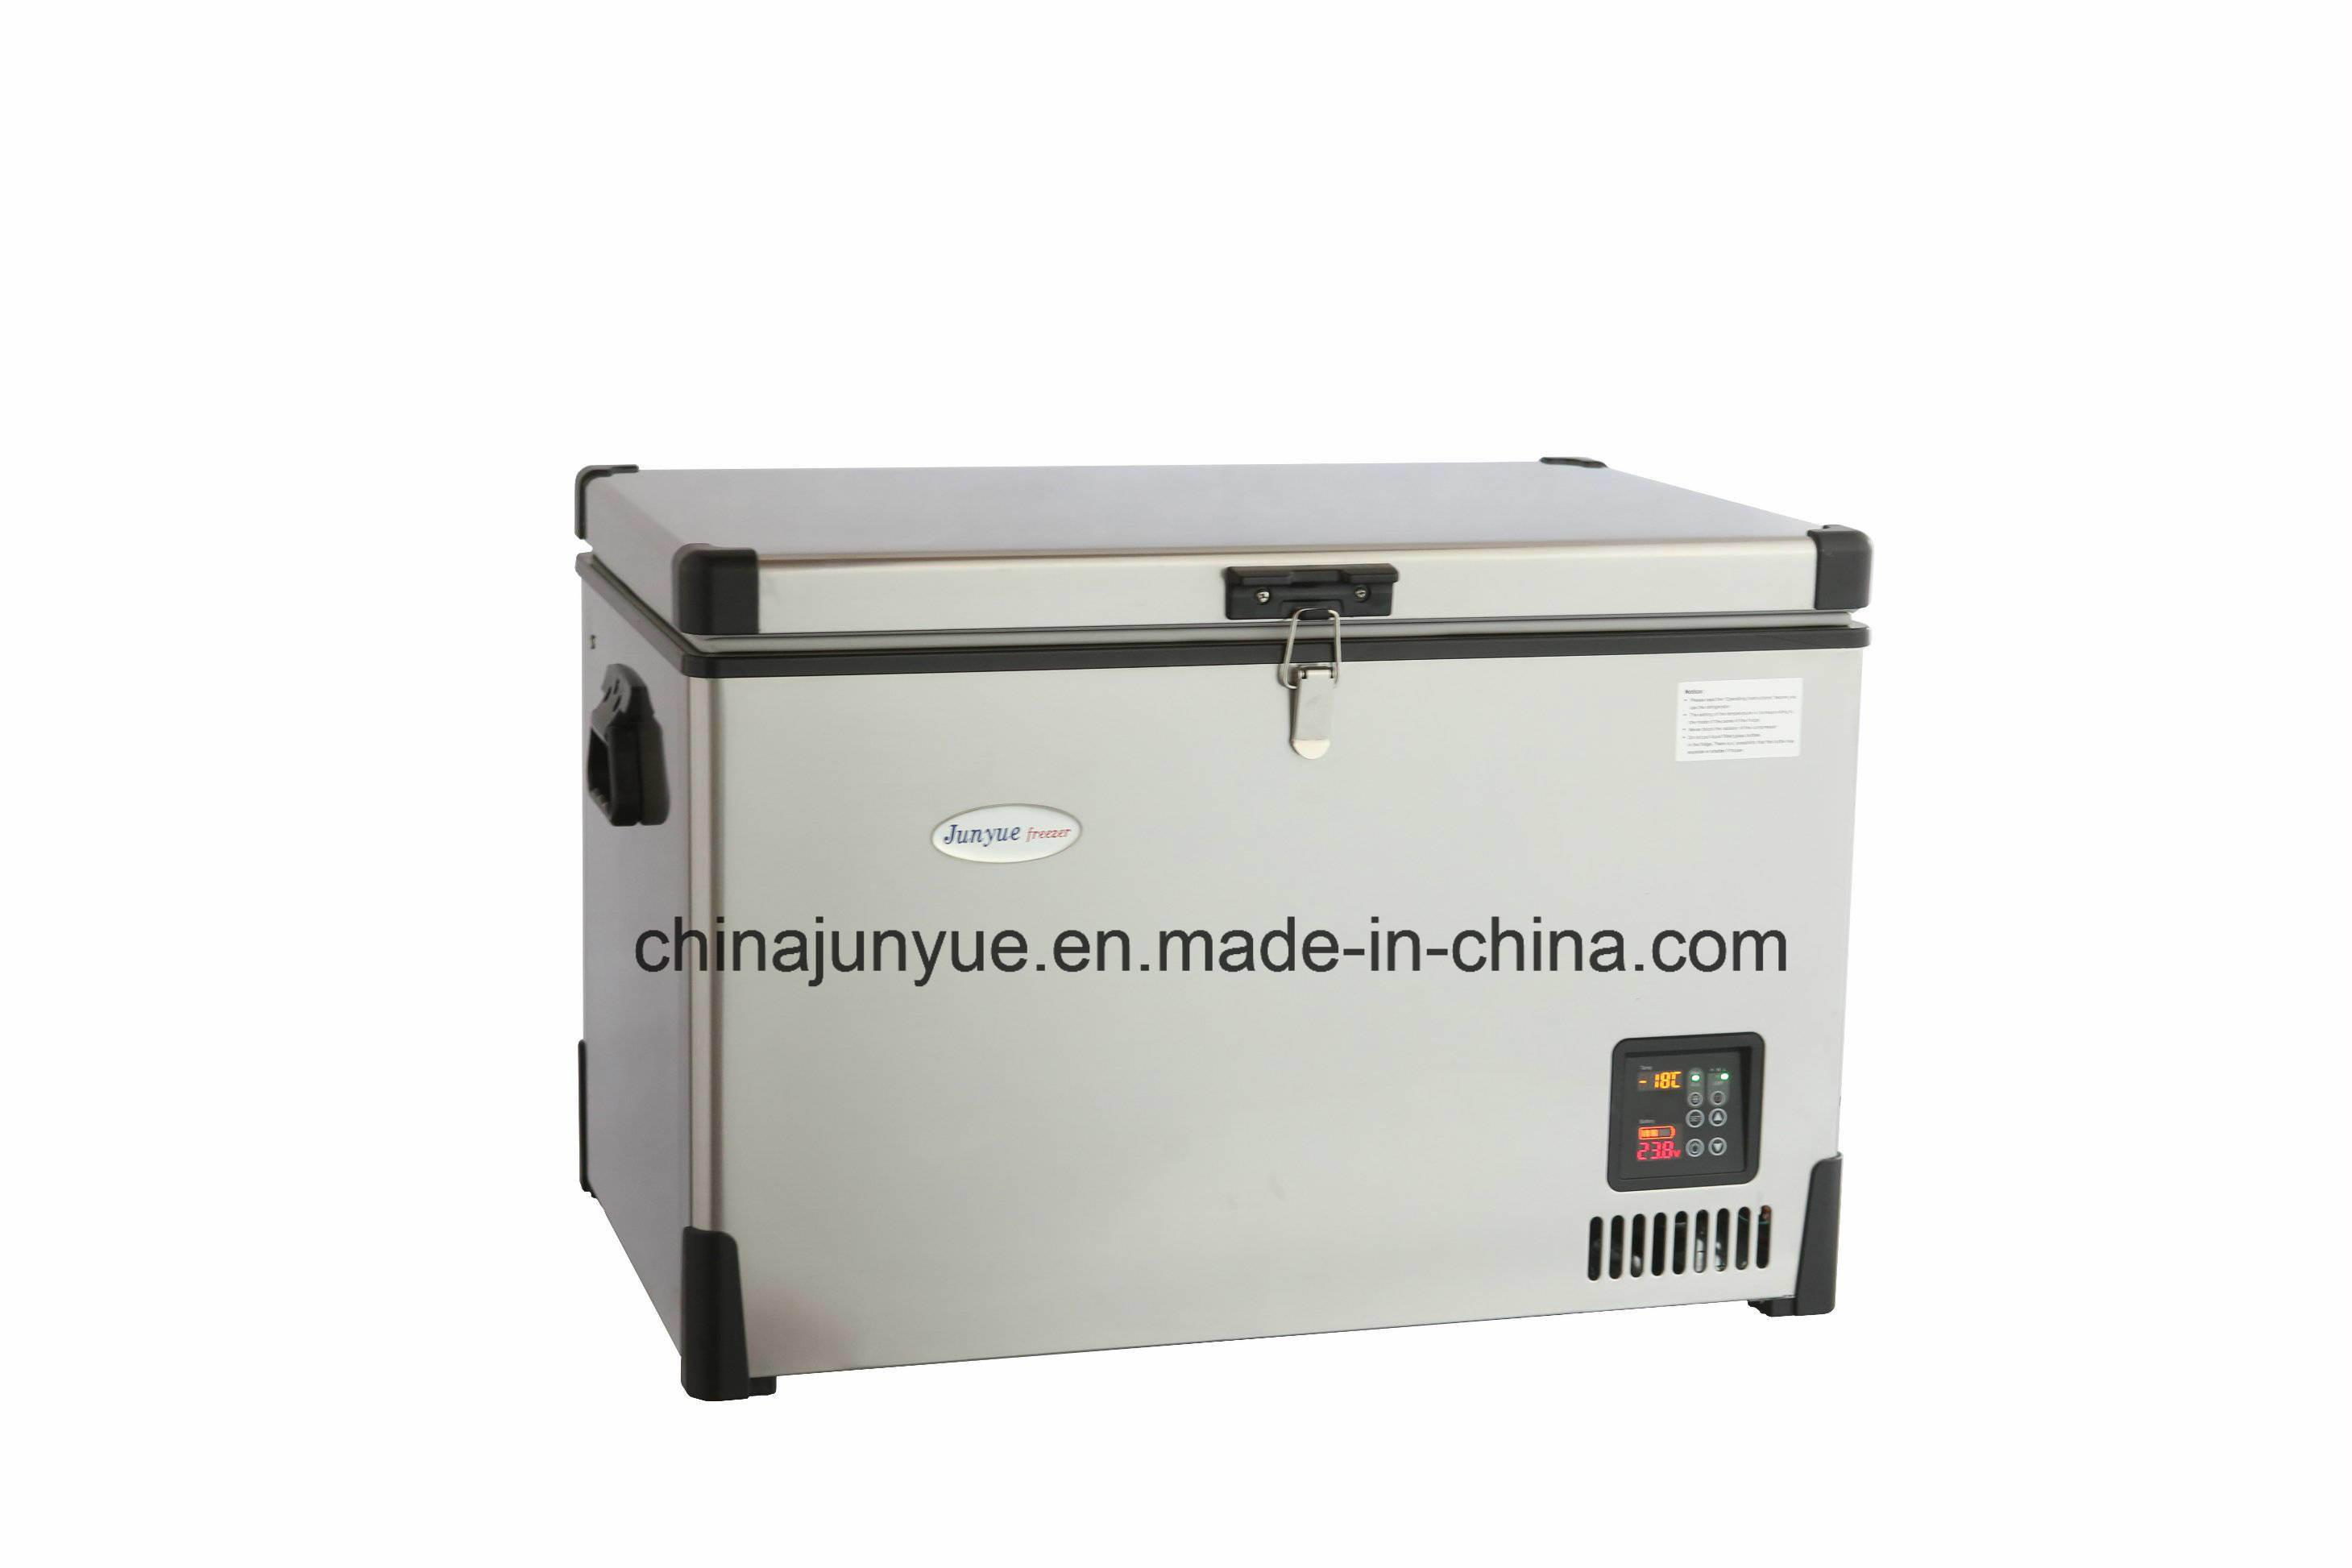 12V 24V Mobile Chest Fridge Refrigerator Freezer Mobile Solar Fridge Freezer Camping Fridge Portable Fridge DC Refrigerator Bd/Bc-75L